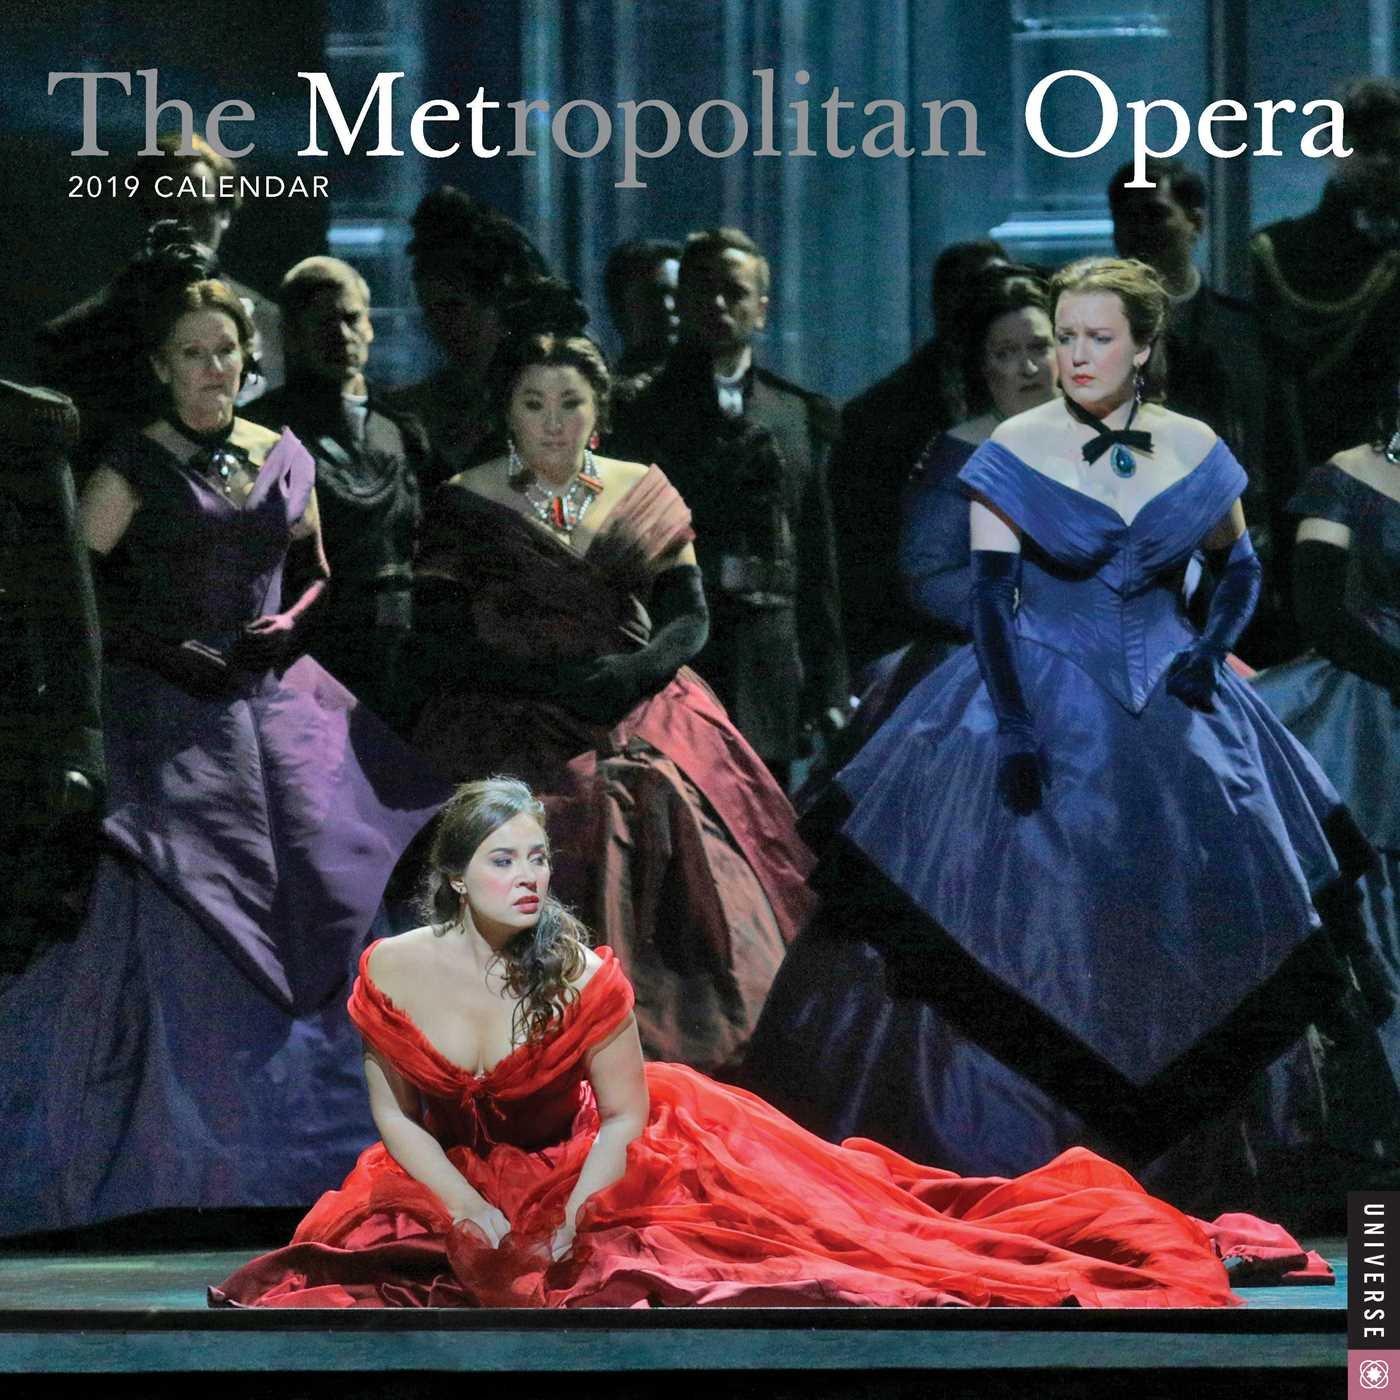 The Metropolitan Opera 2019 Wall Calendar by Universe Publishing